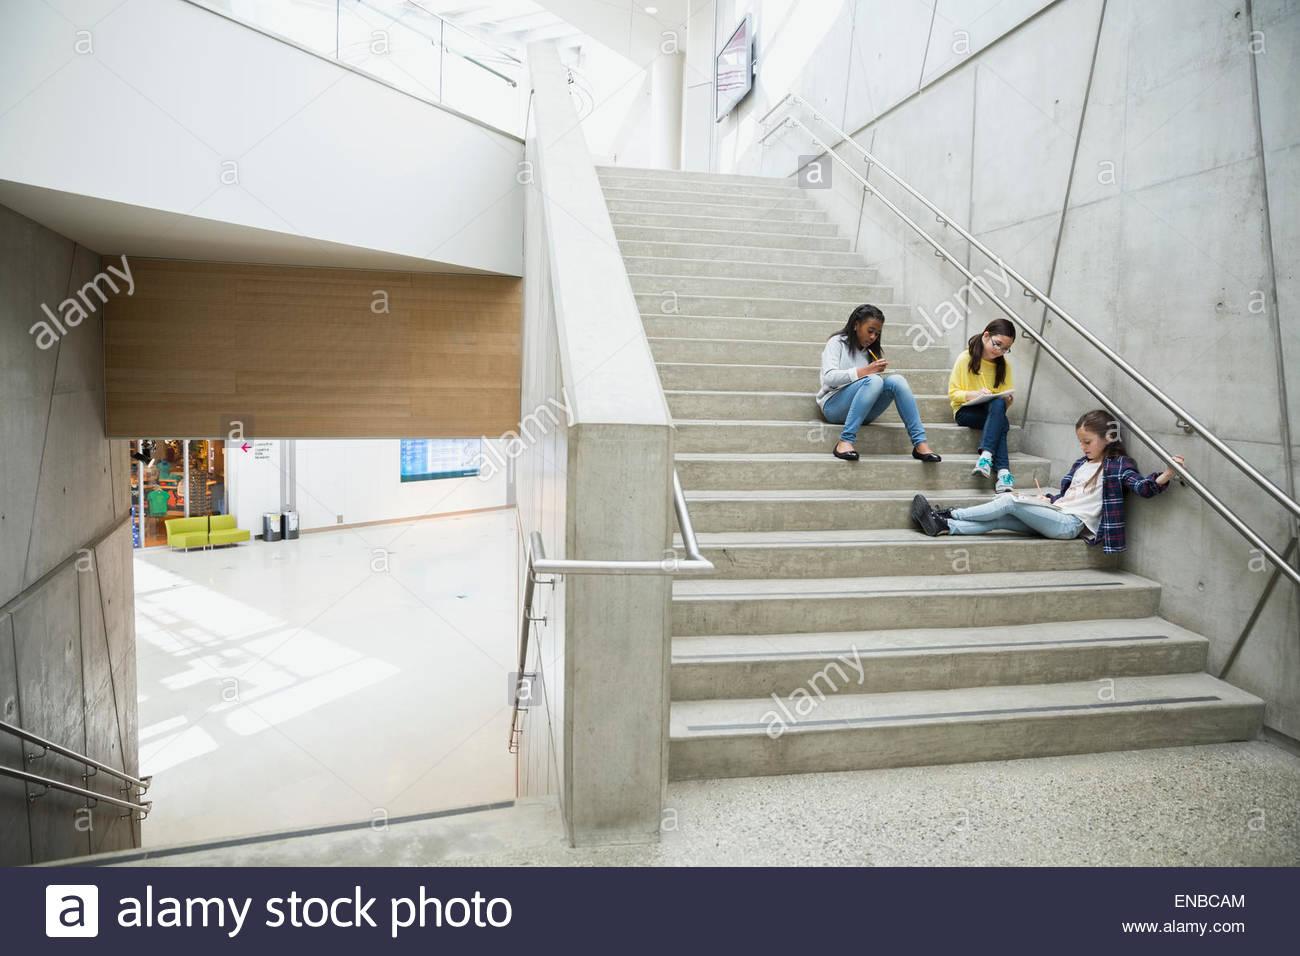 Schoolgirls Doing Homework On Stairs Outside   Stock Image